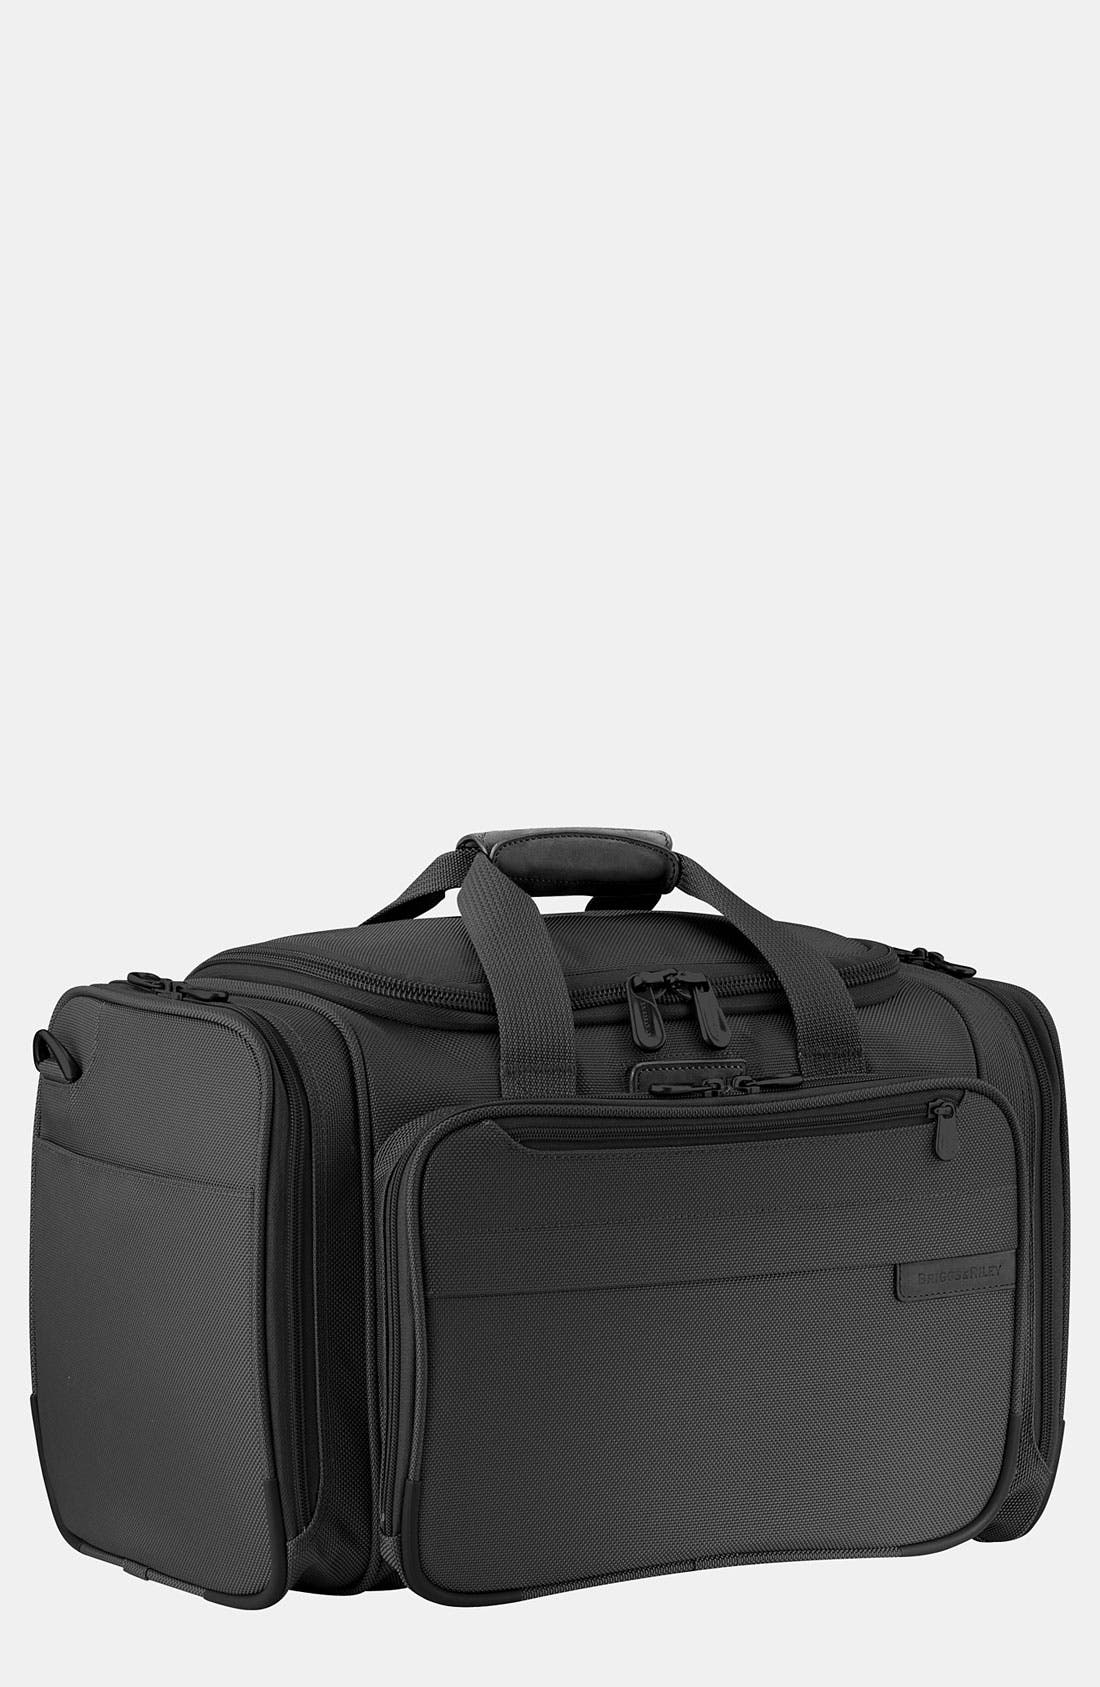 'Baseline - Deluxe' Duffel Bag,                         Main,                         color, BLACK